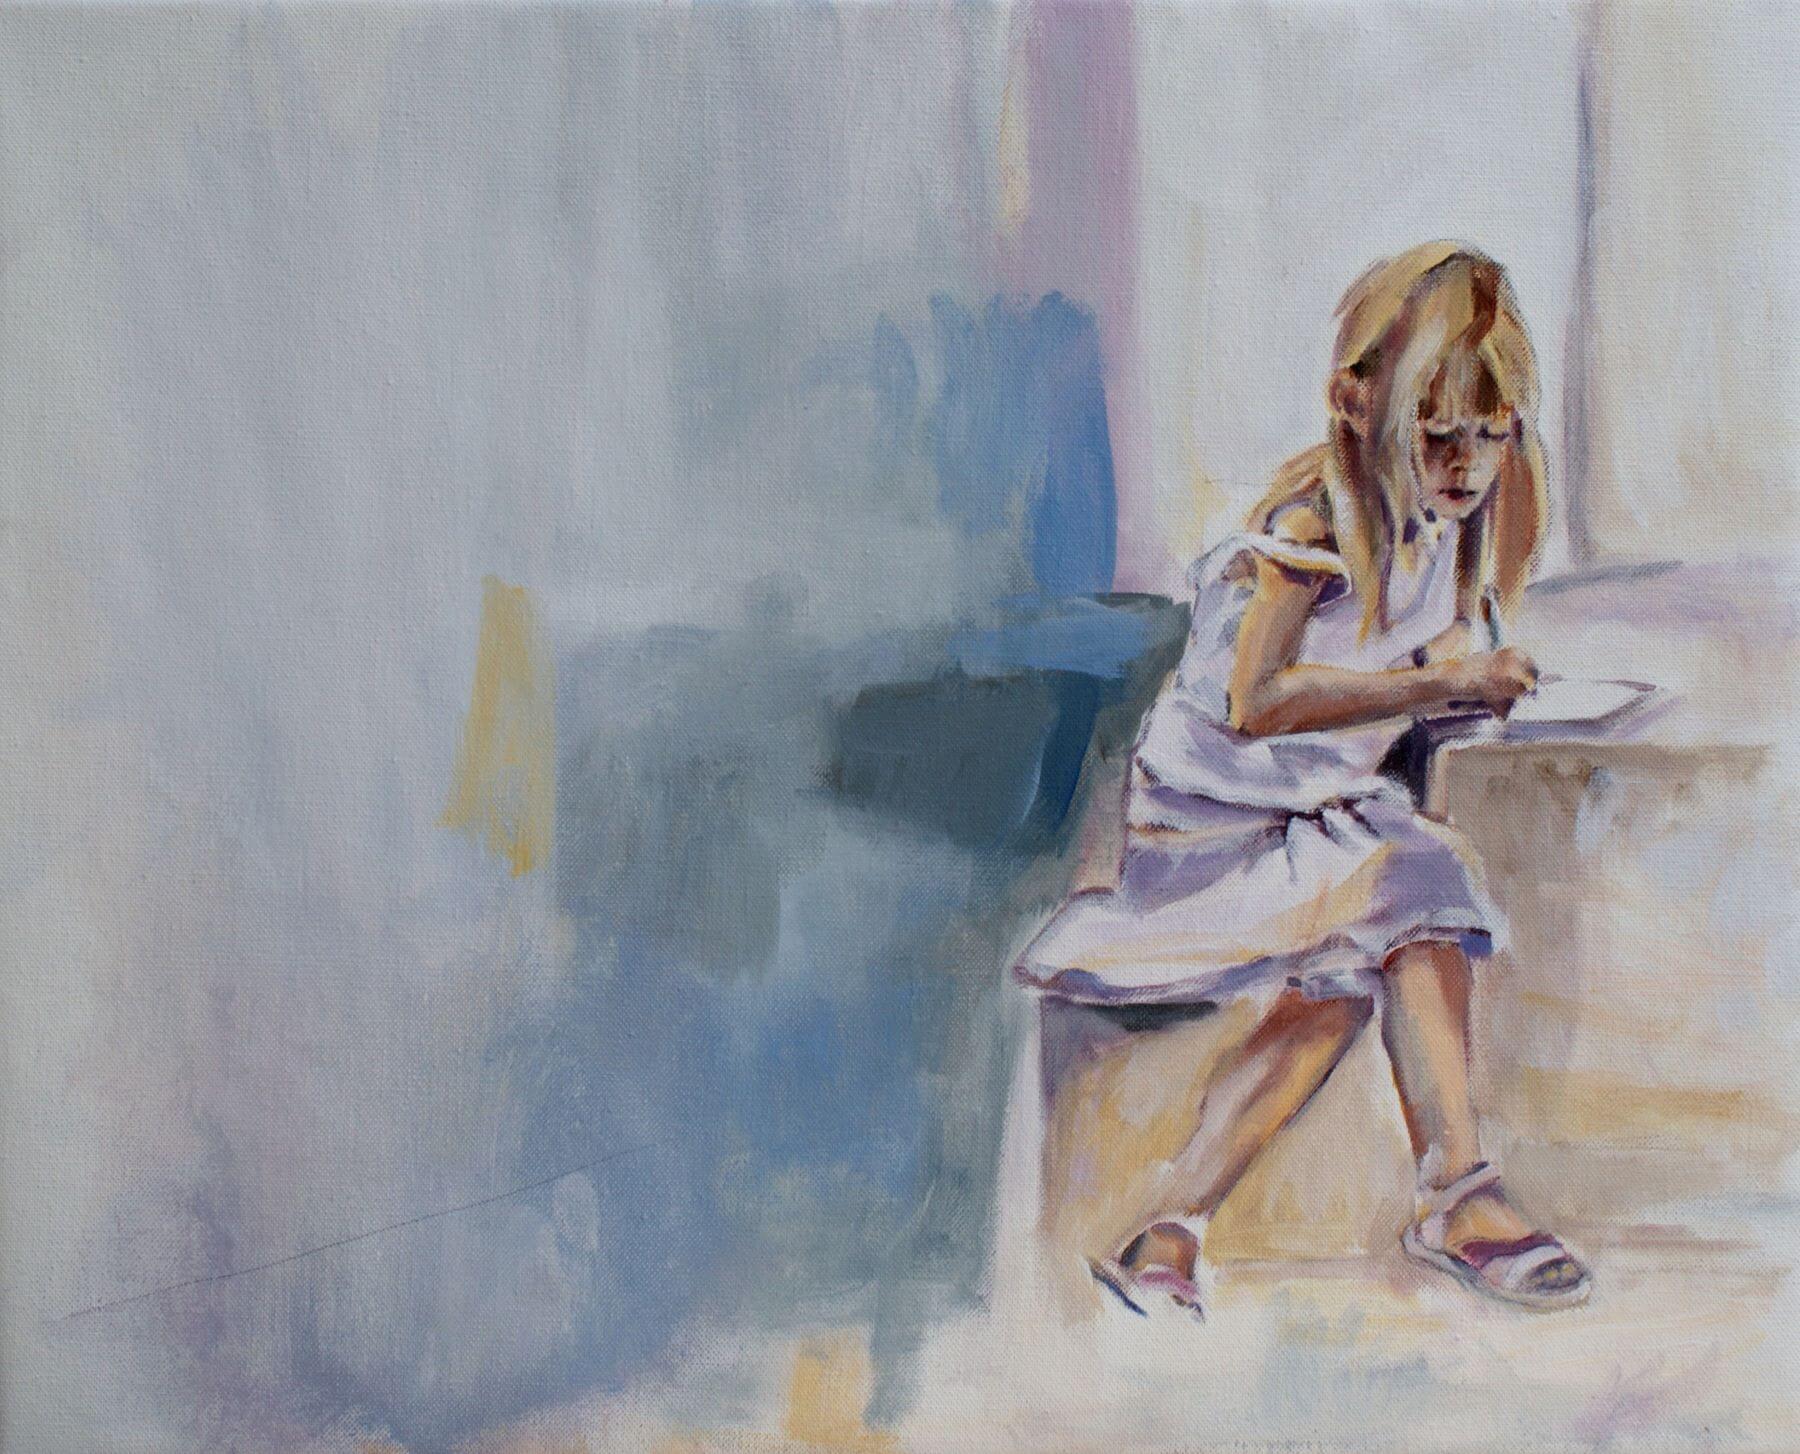 Leda - painting, acrylic on canvas by artist Neva Bergemann